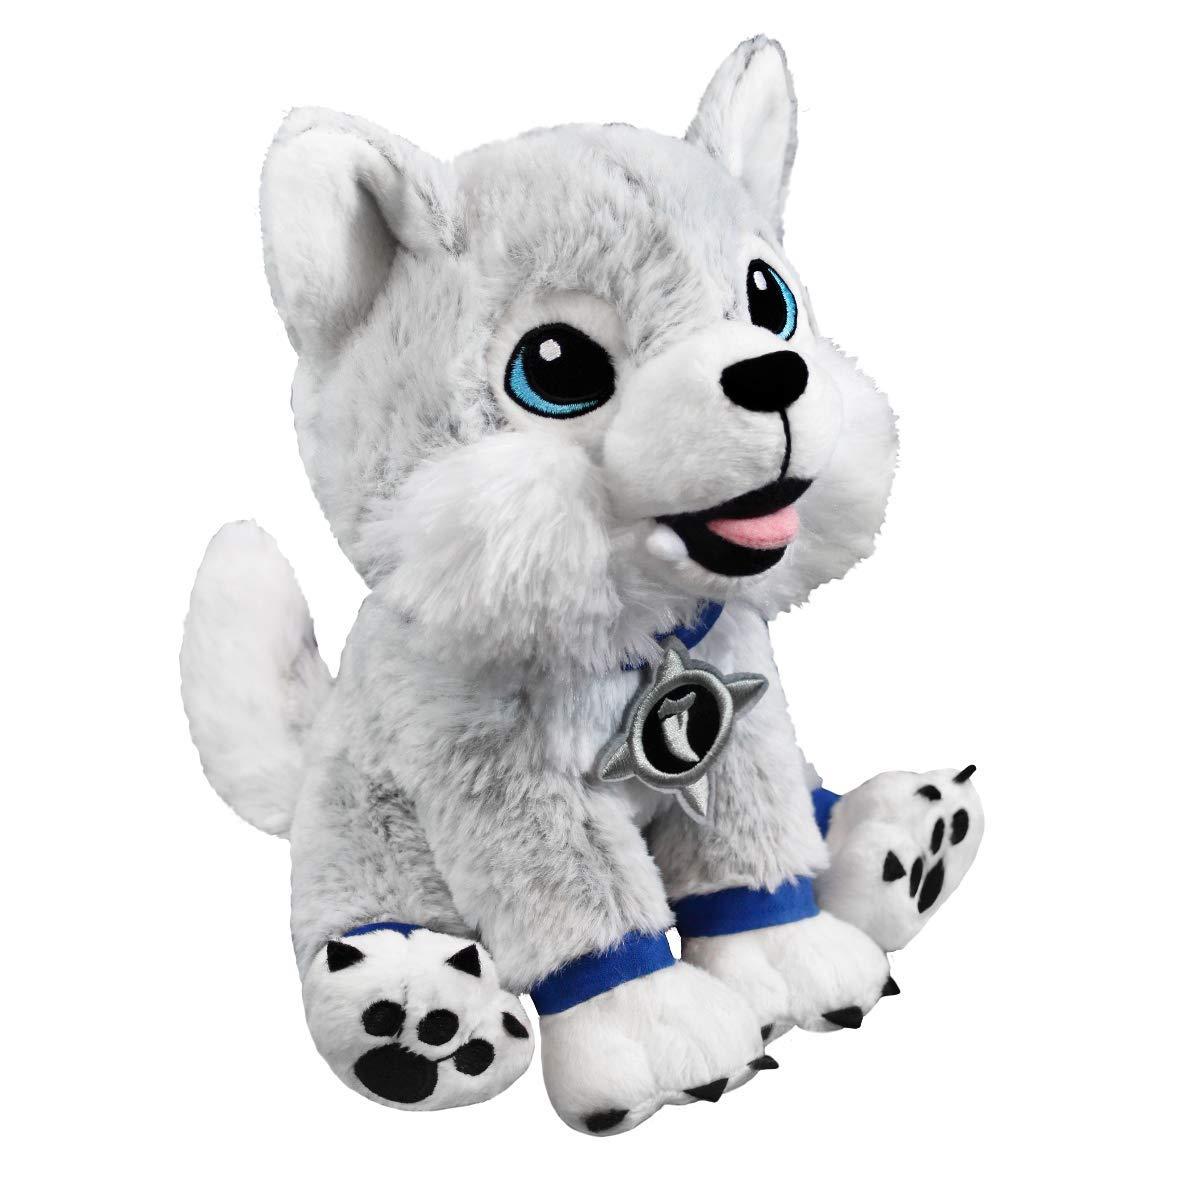 Official Blizzard Snowfang Frostwolf Cub Plush by Blizzard Entertainment